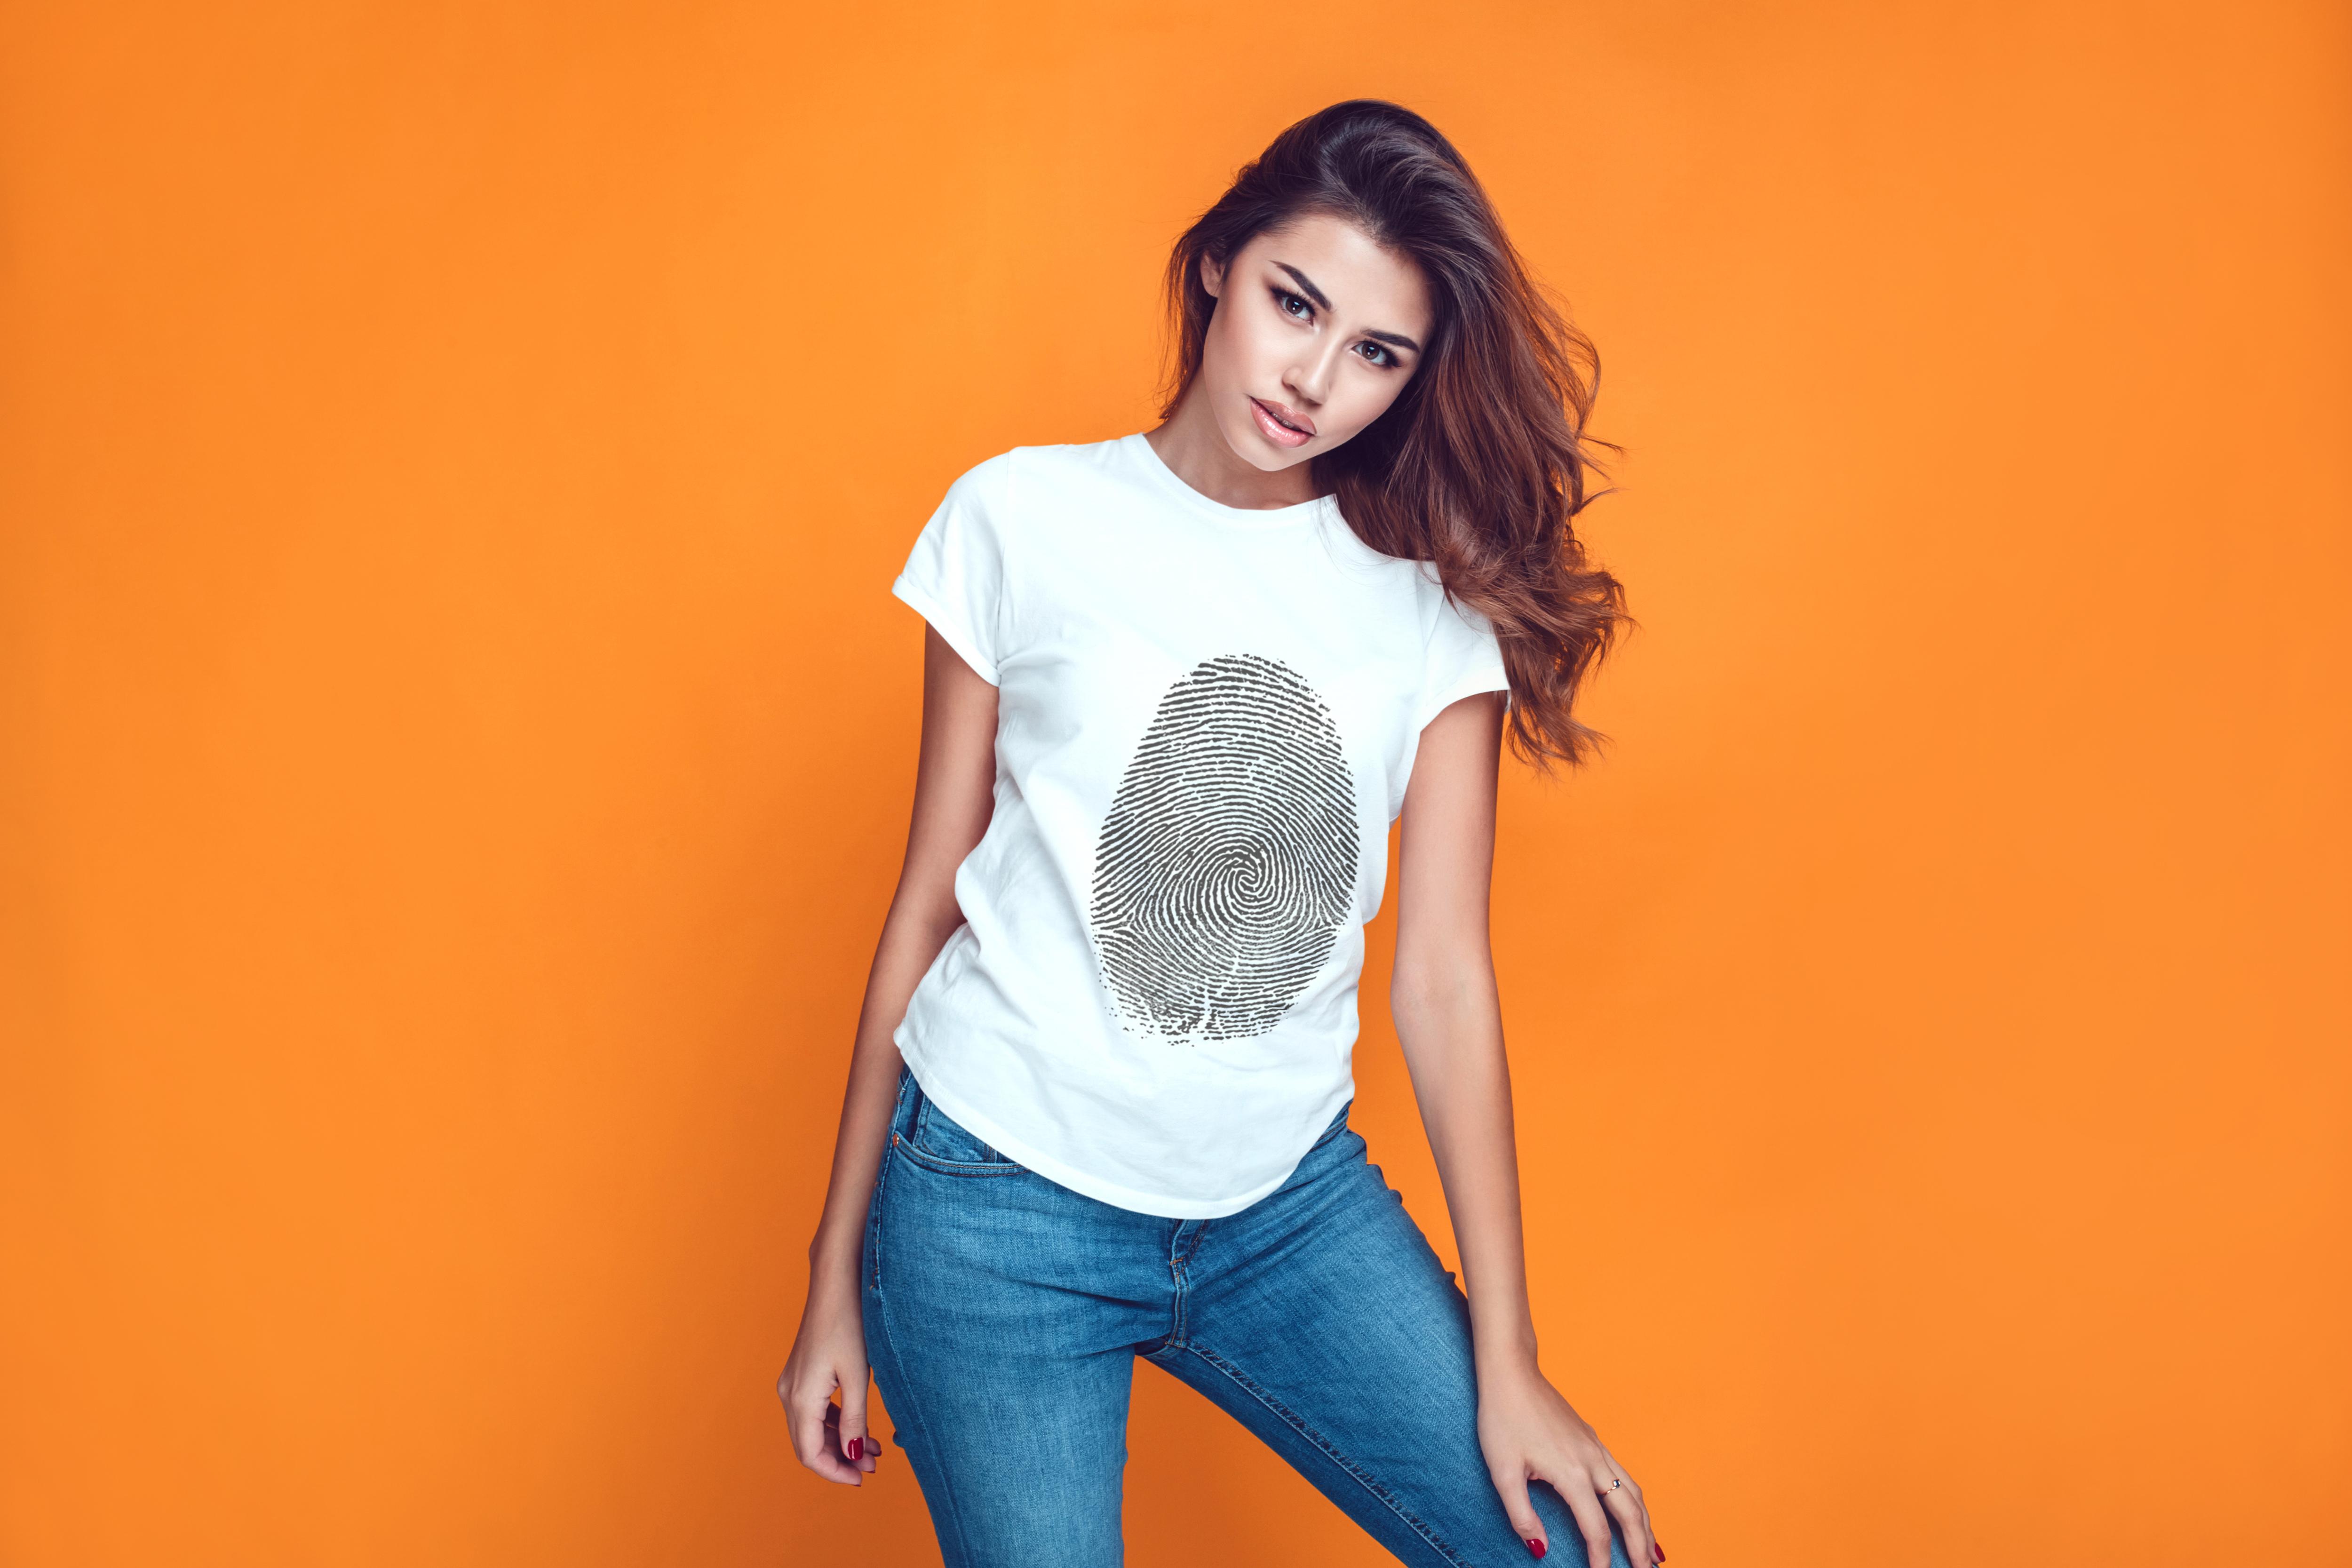 T-Shirt Mock-Up Vol.22 2017 example image 13